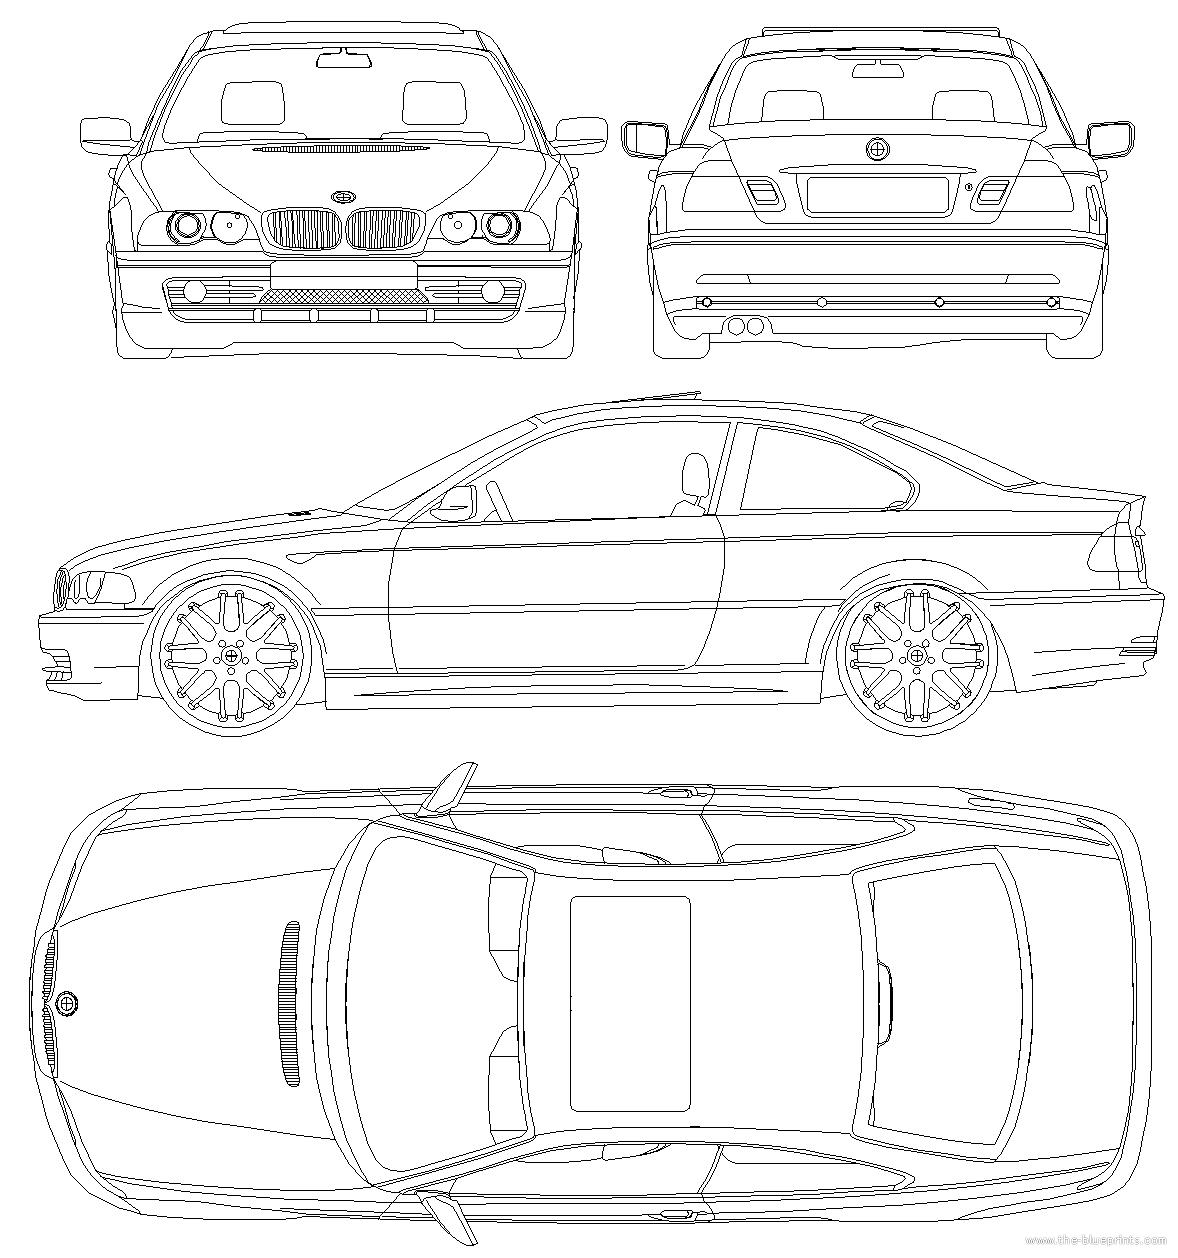 Blueprints > Cars > BMW > BMW 3-Series Coupe with CSL Rims